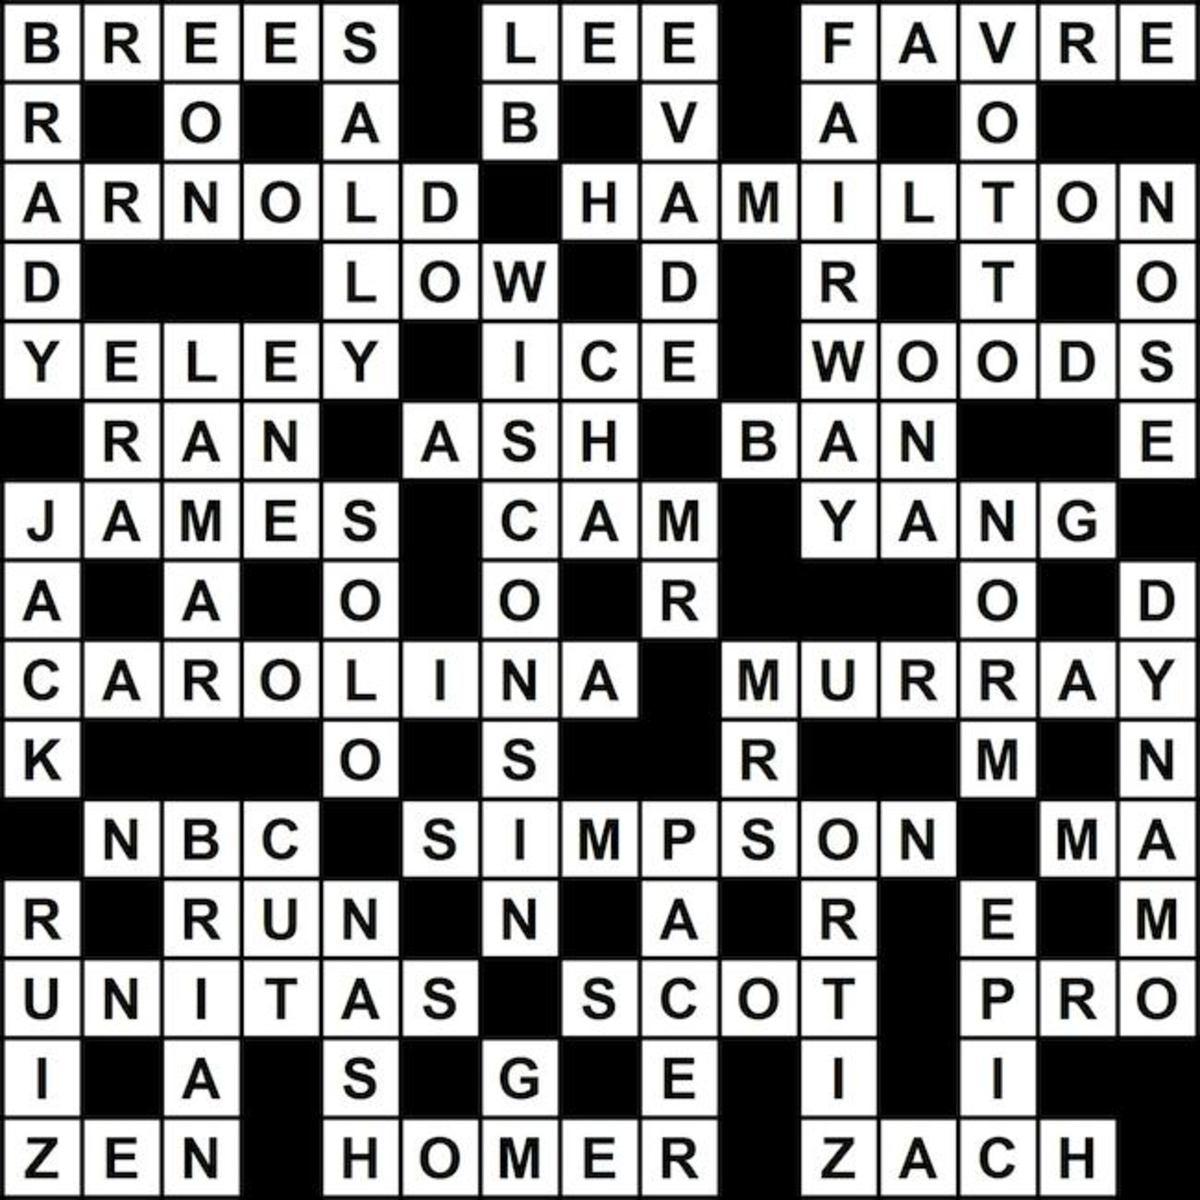 CrosswordSolutionsAugust12.jpg